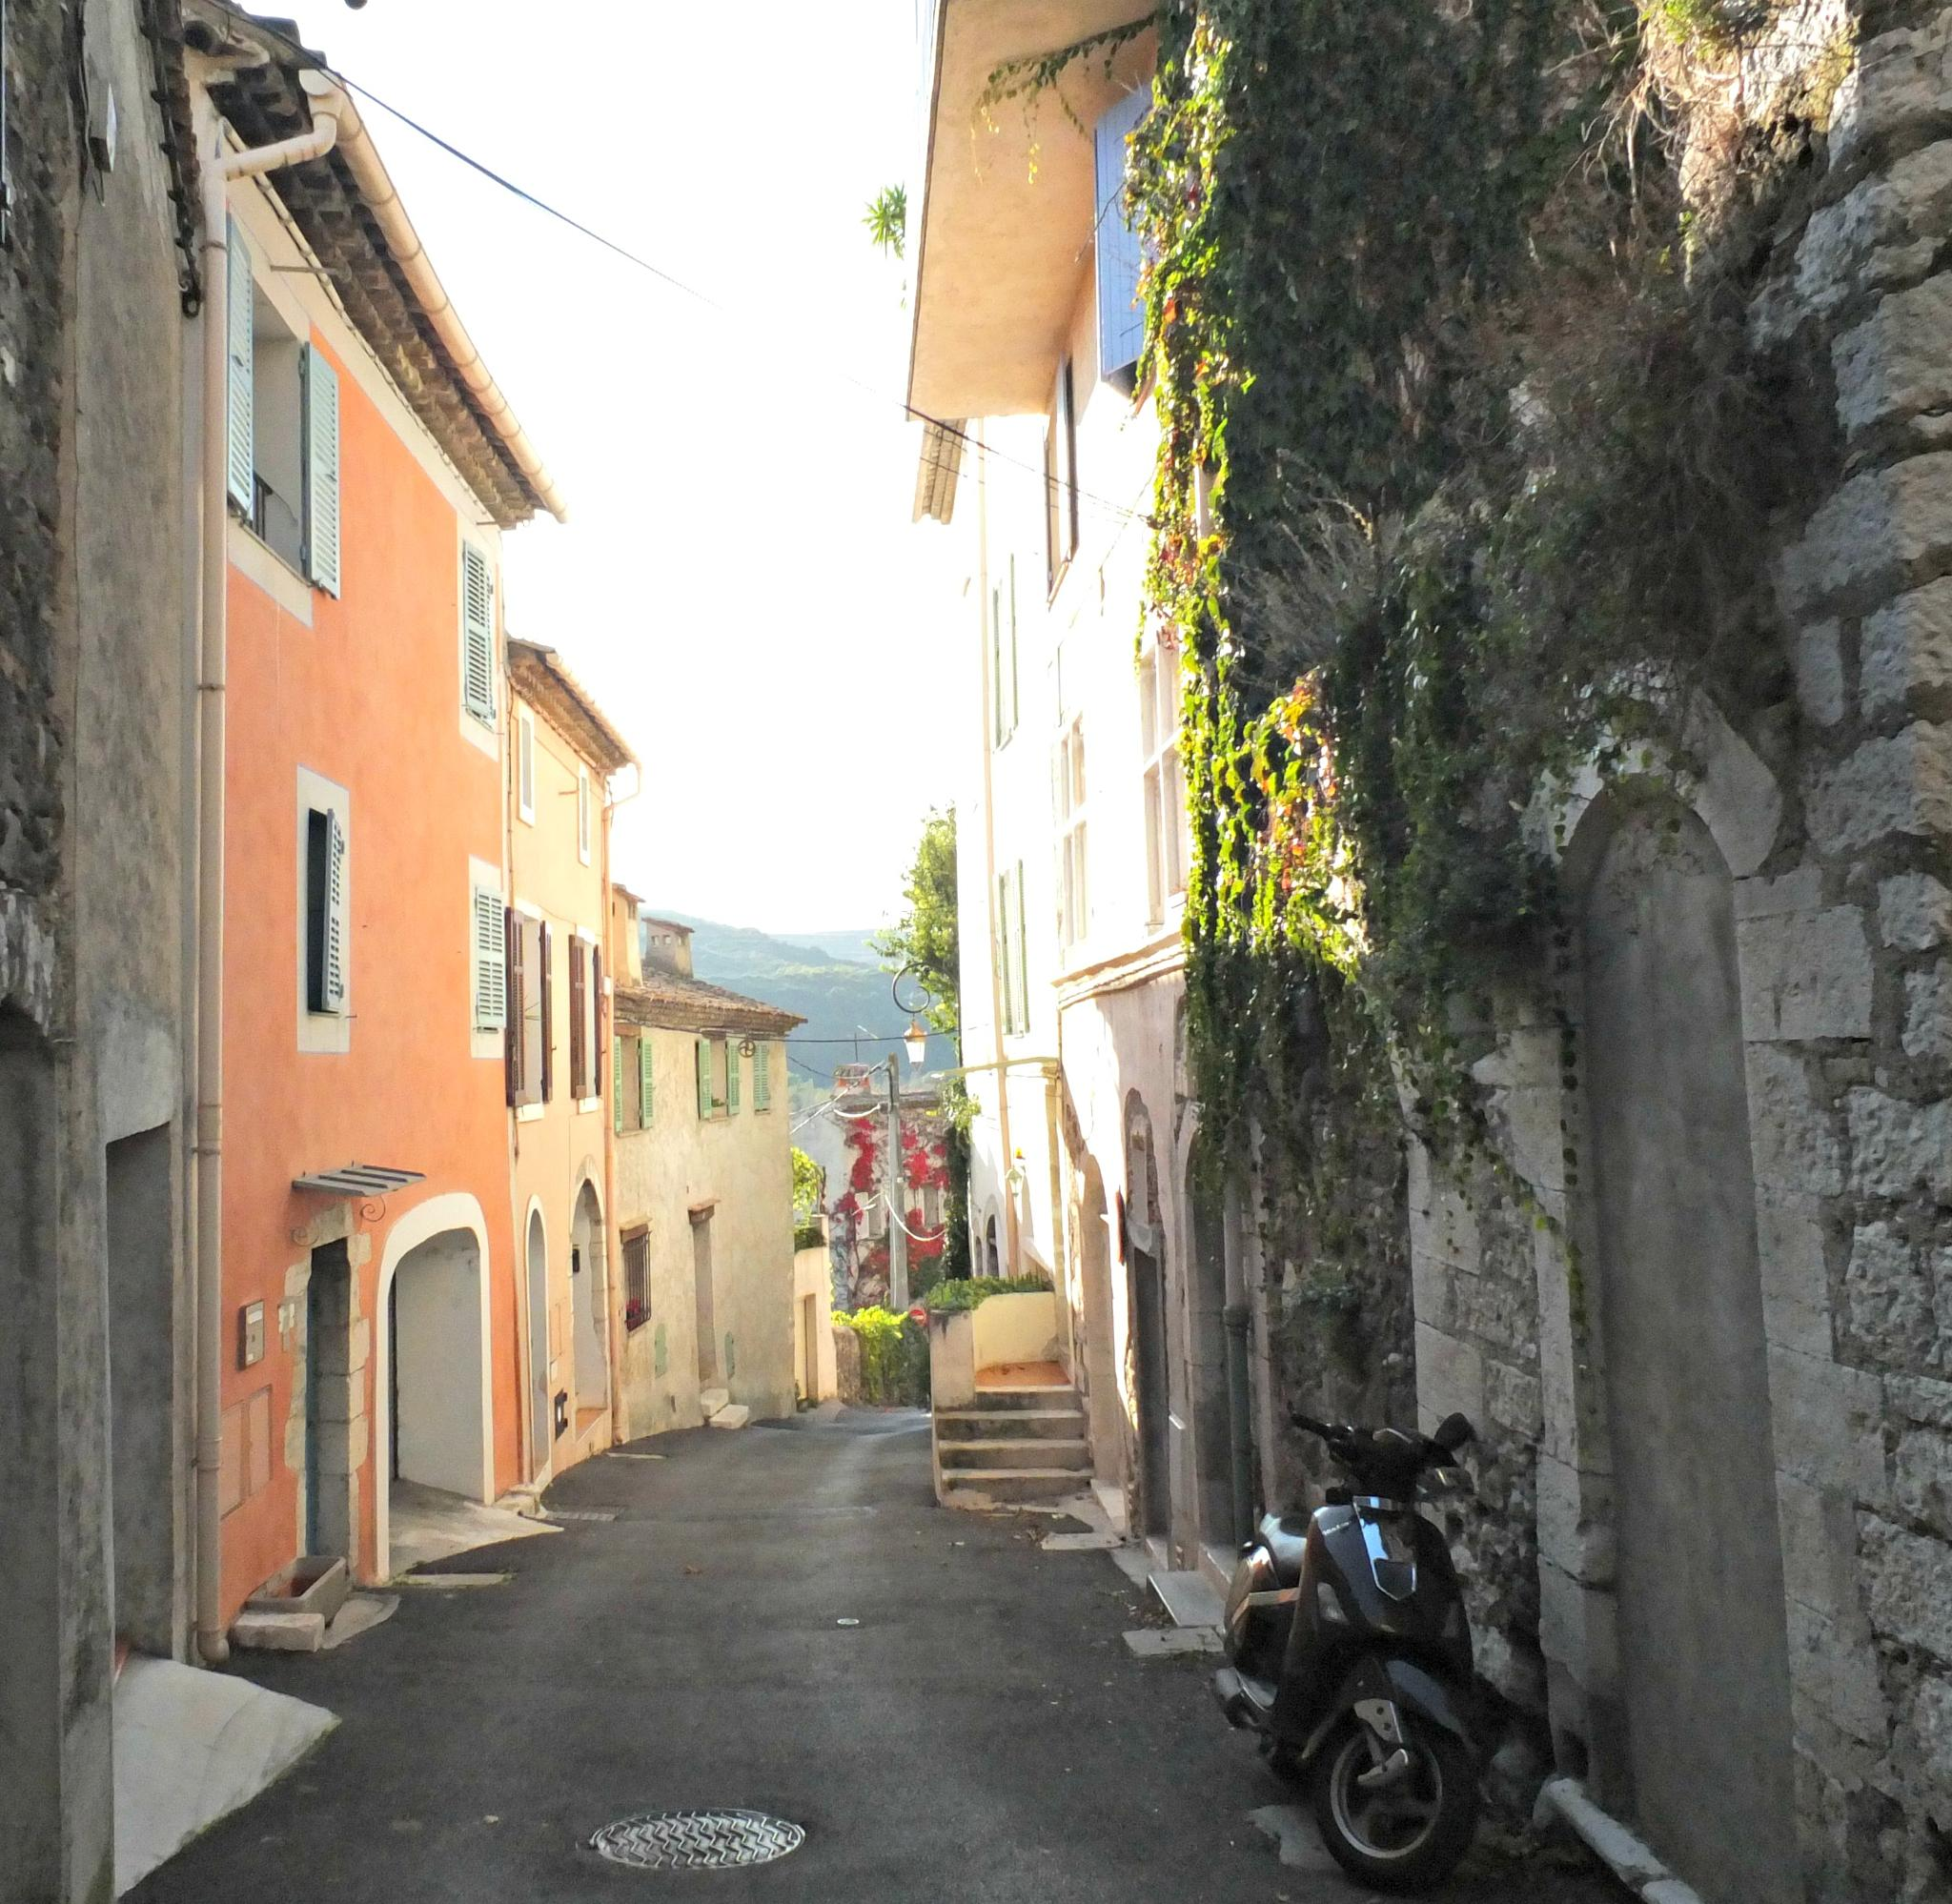 Hilly village street by Cora